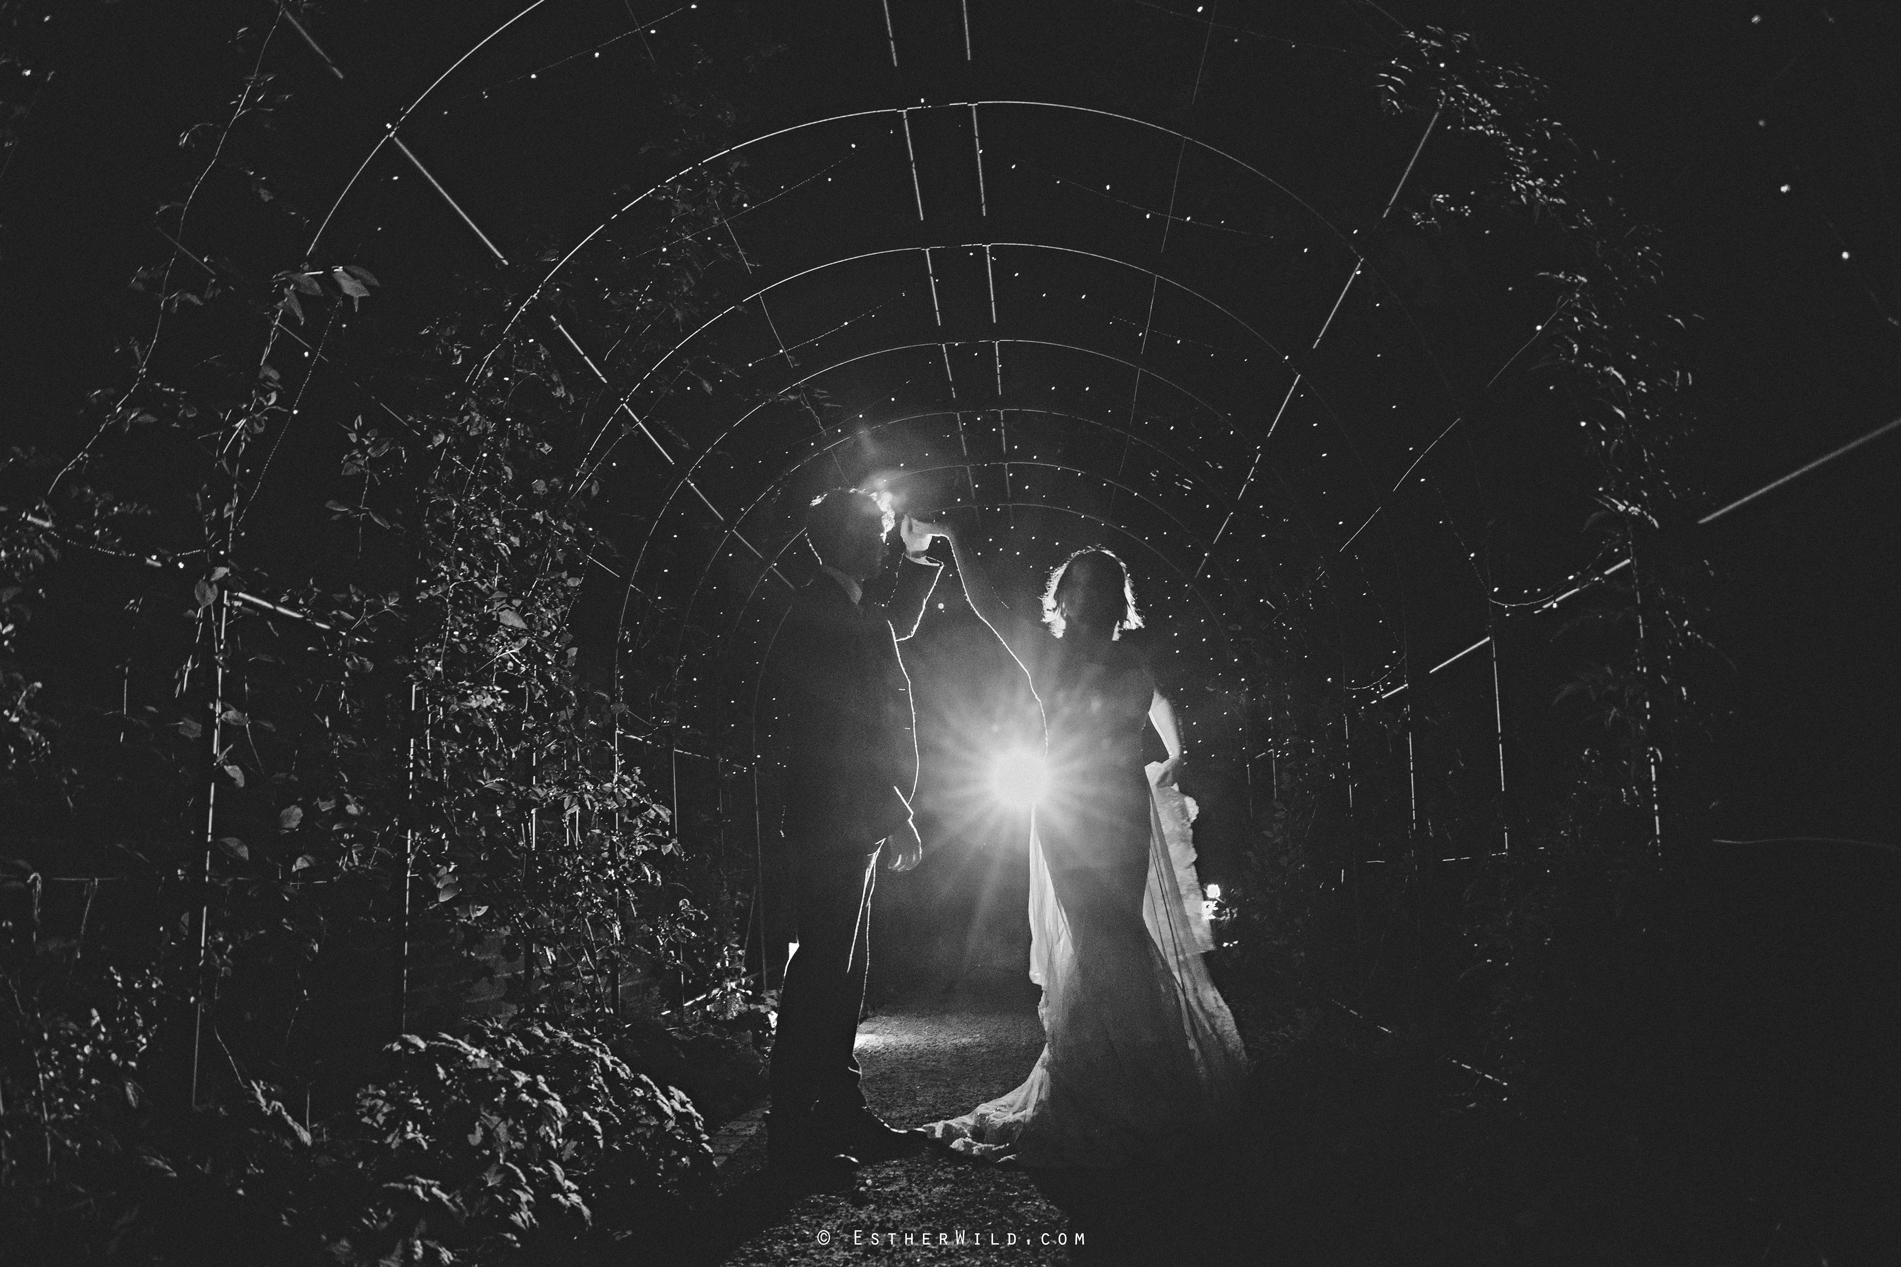 Reading_Room_Weddings_Alby_Norwich_Photographer_Esther_Wild_IMG_2947-1.jpg